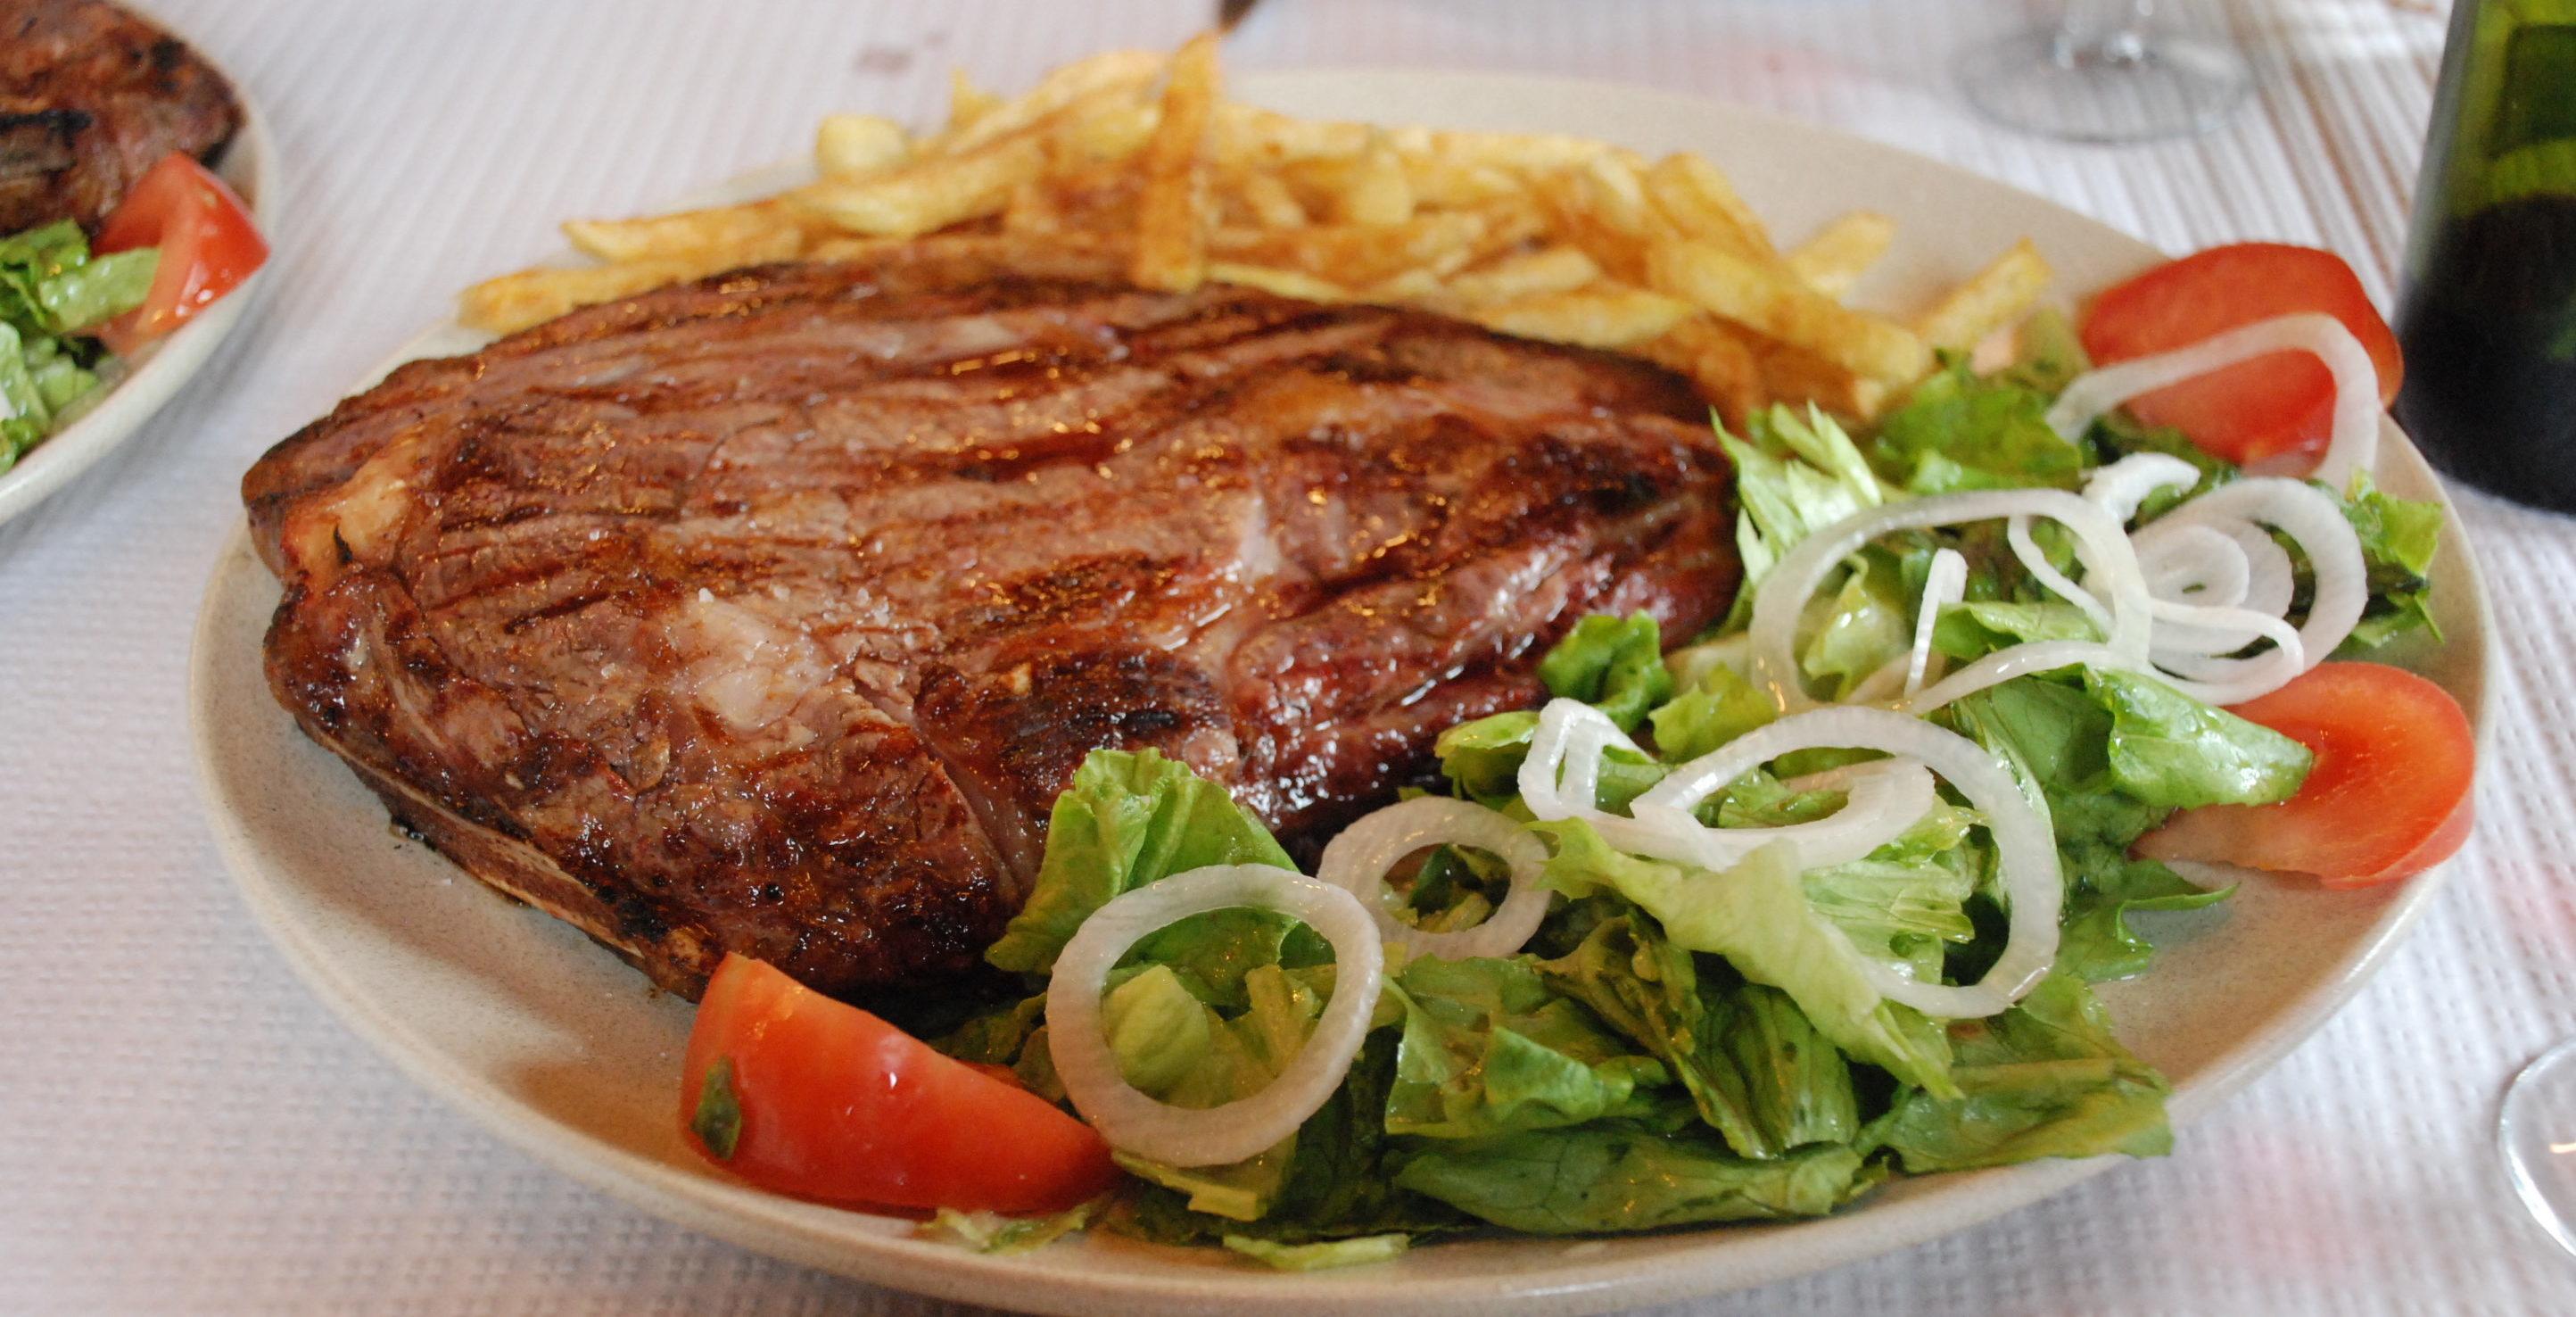 Chuleta steak big enough for 2